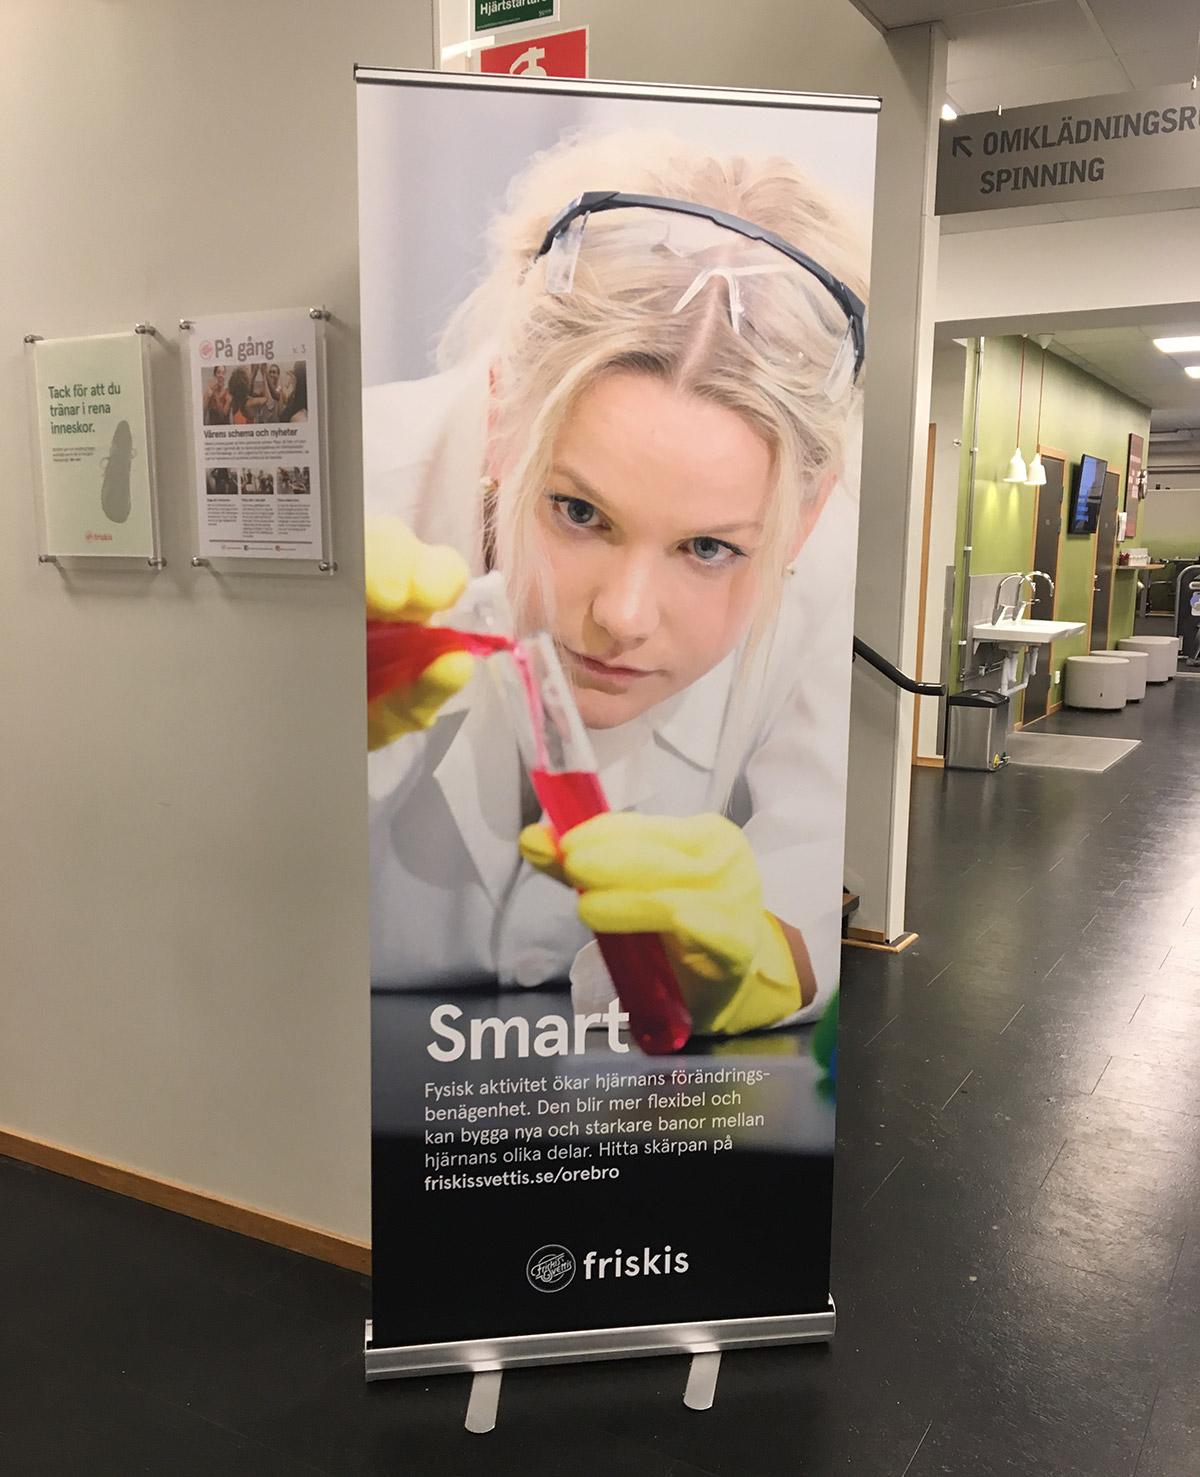 Friskis & Svettis reklamkampanj: Pigg - vi vet hur